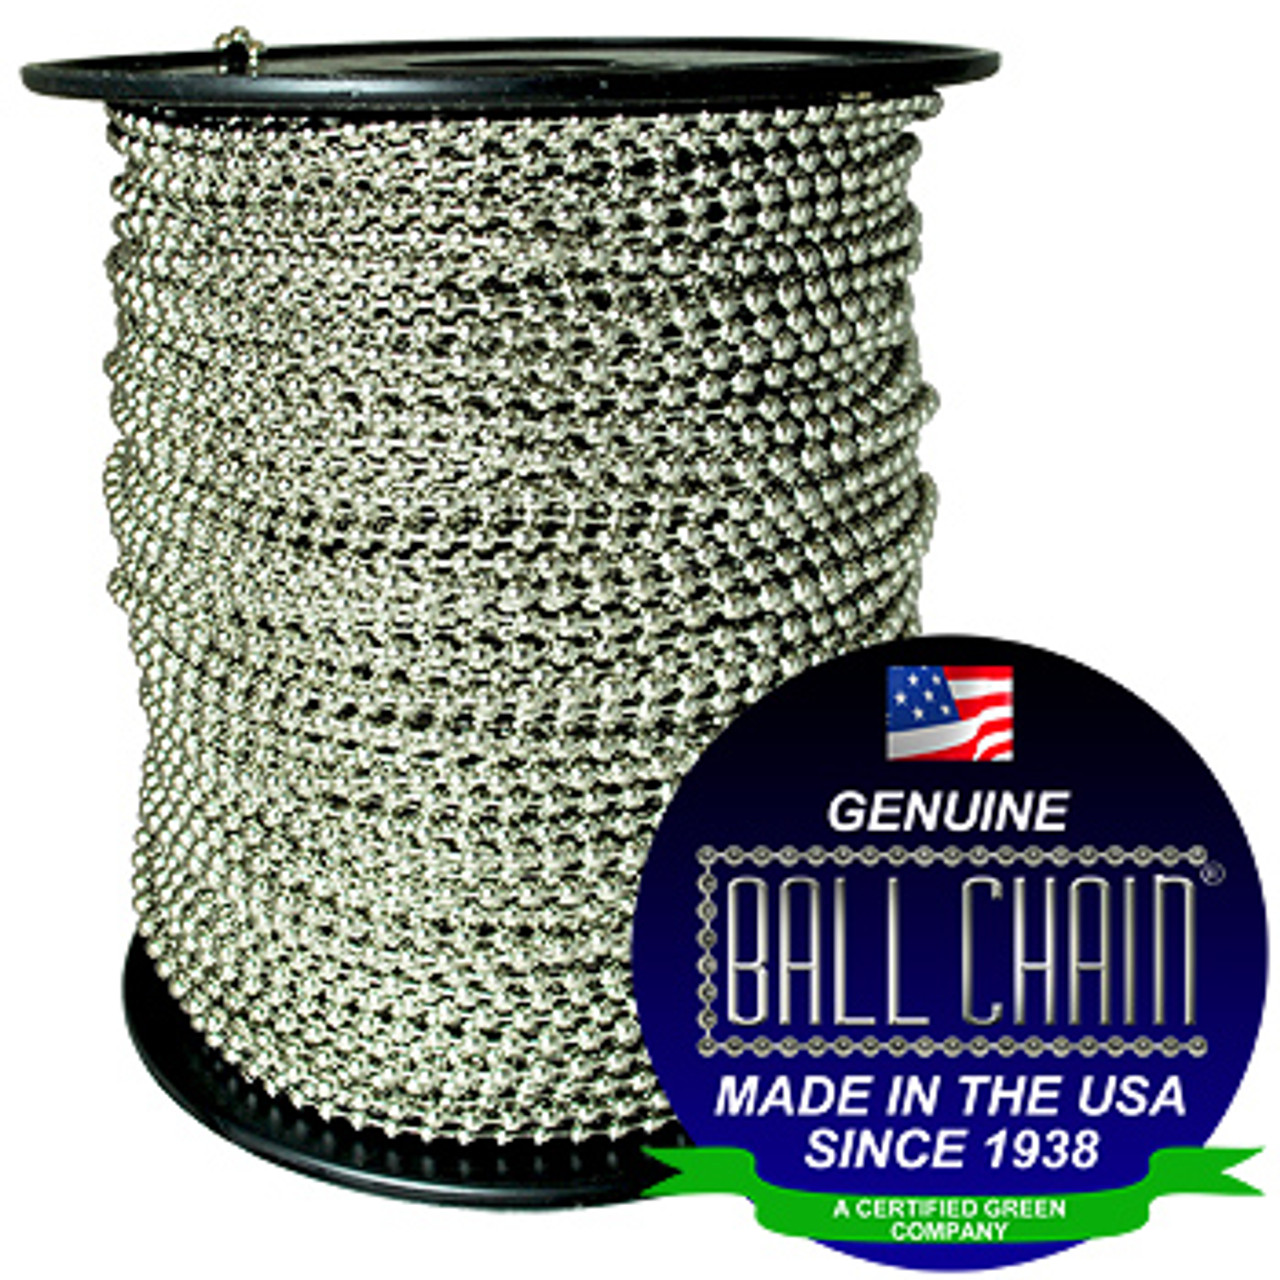 #20 Nickel Plated Steel Ball Chain Spool